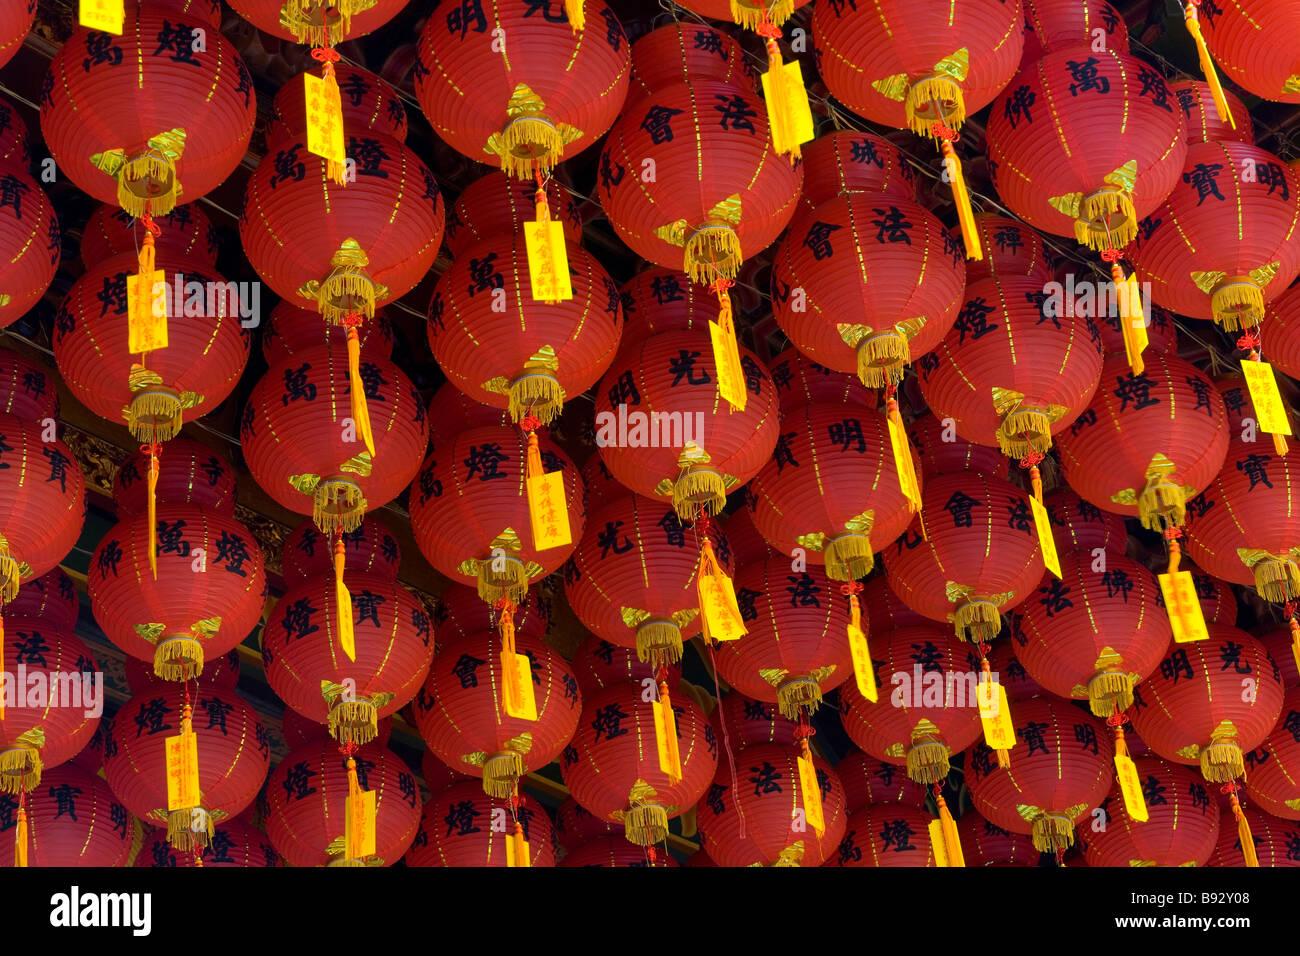 Chinesische Laternen Kek Lok Si Temple, Penang, Malaysia Stockbild